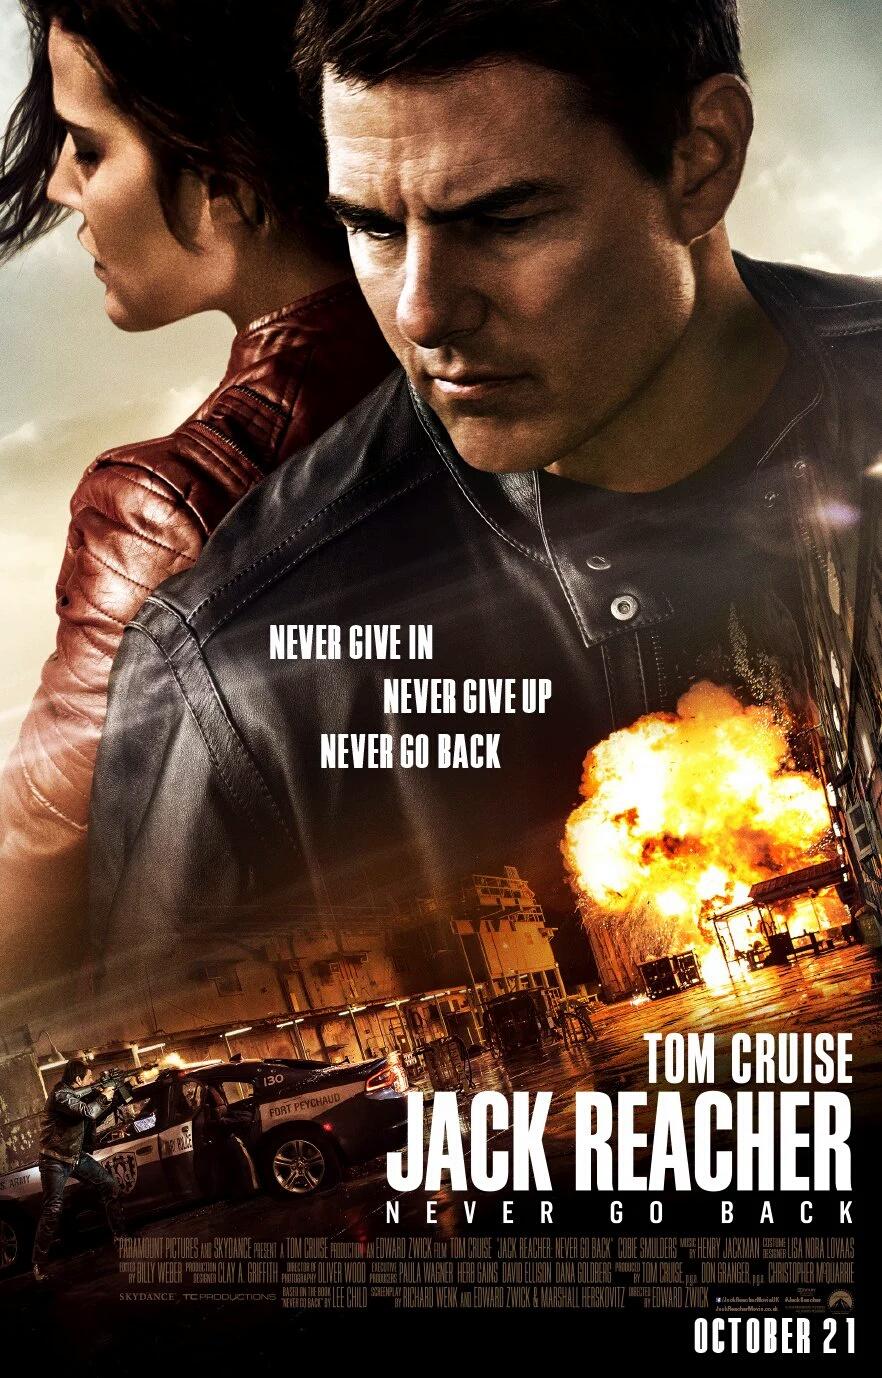 Jack Reacher 2 (2016) Download In 300MB Worldfree4u